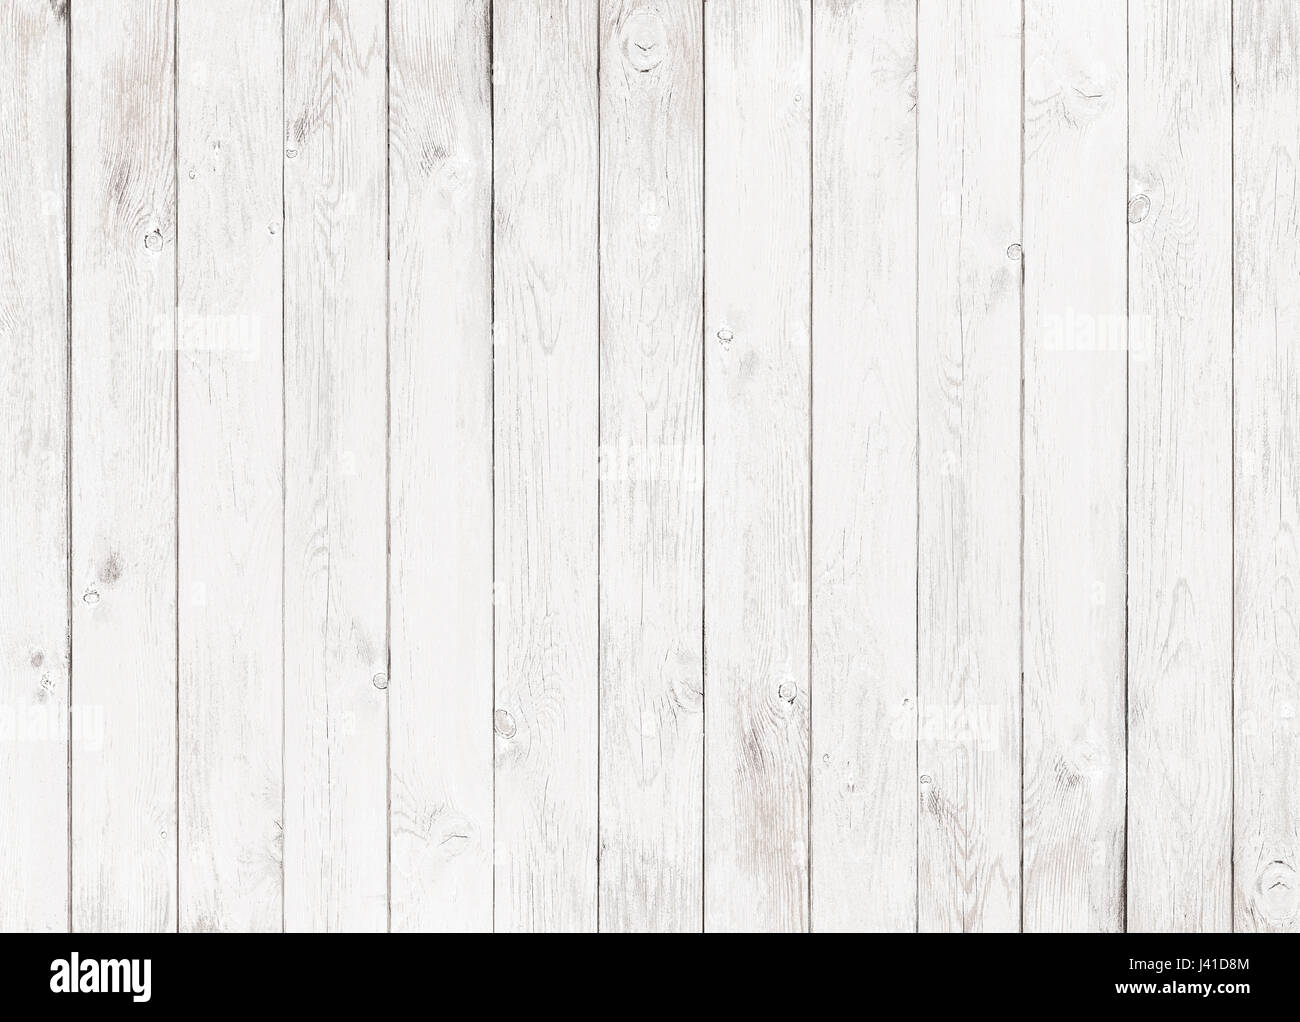 Fondo de textura de madera blanca Imagen De Stock